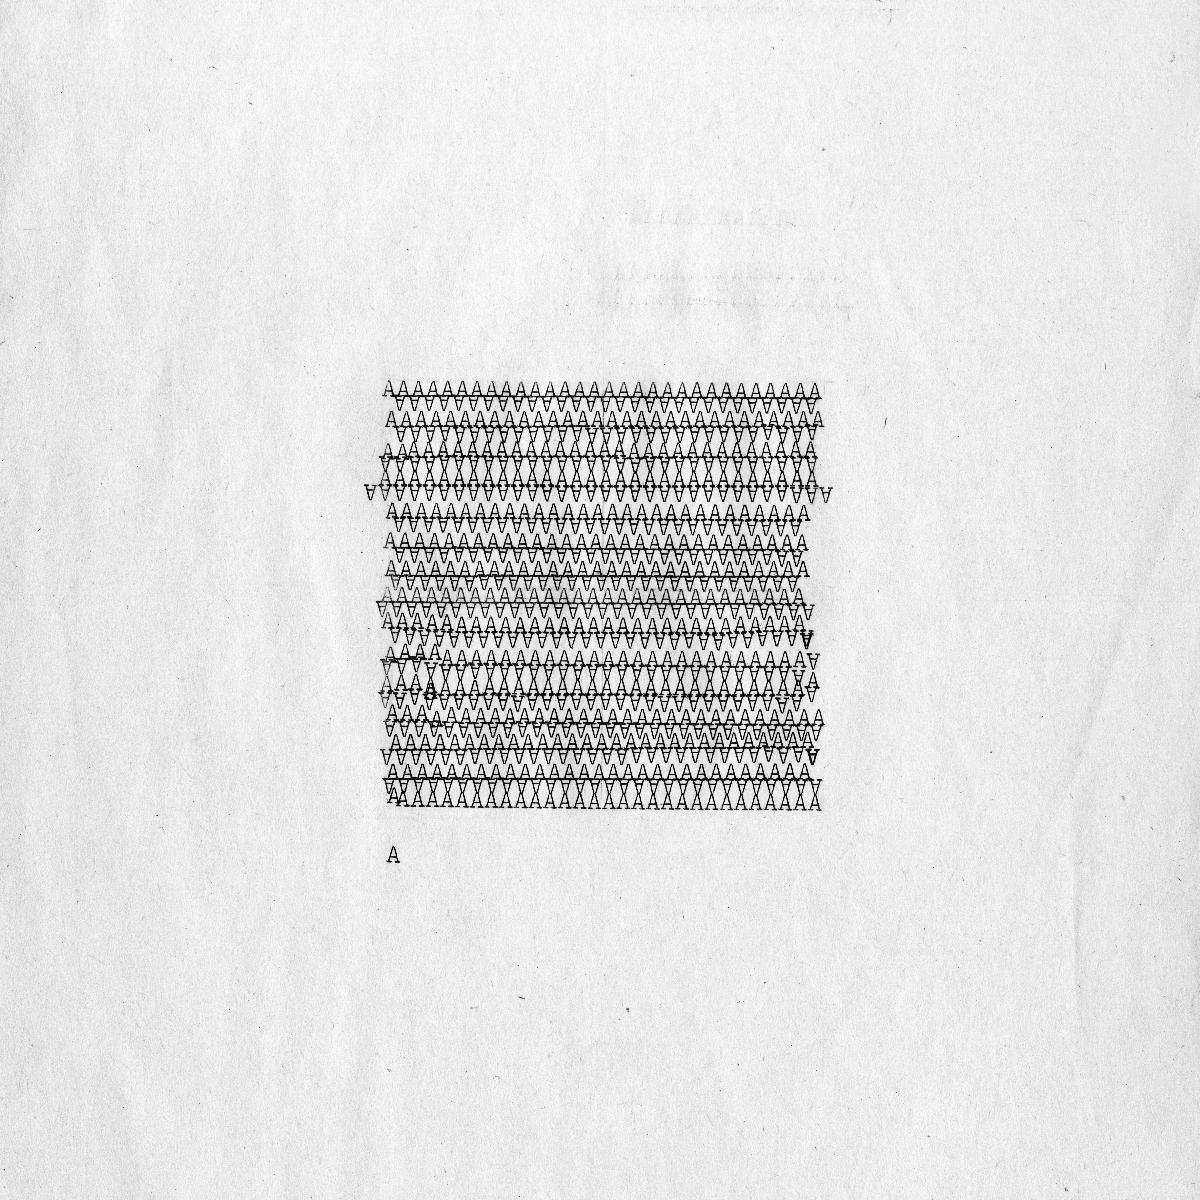 alphabet series was typed on Smith Corona Coronet-Super-12